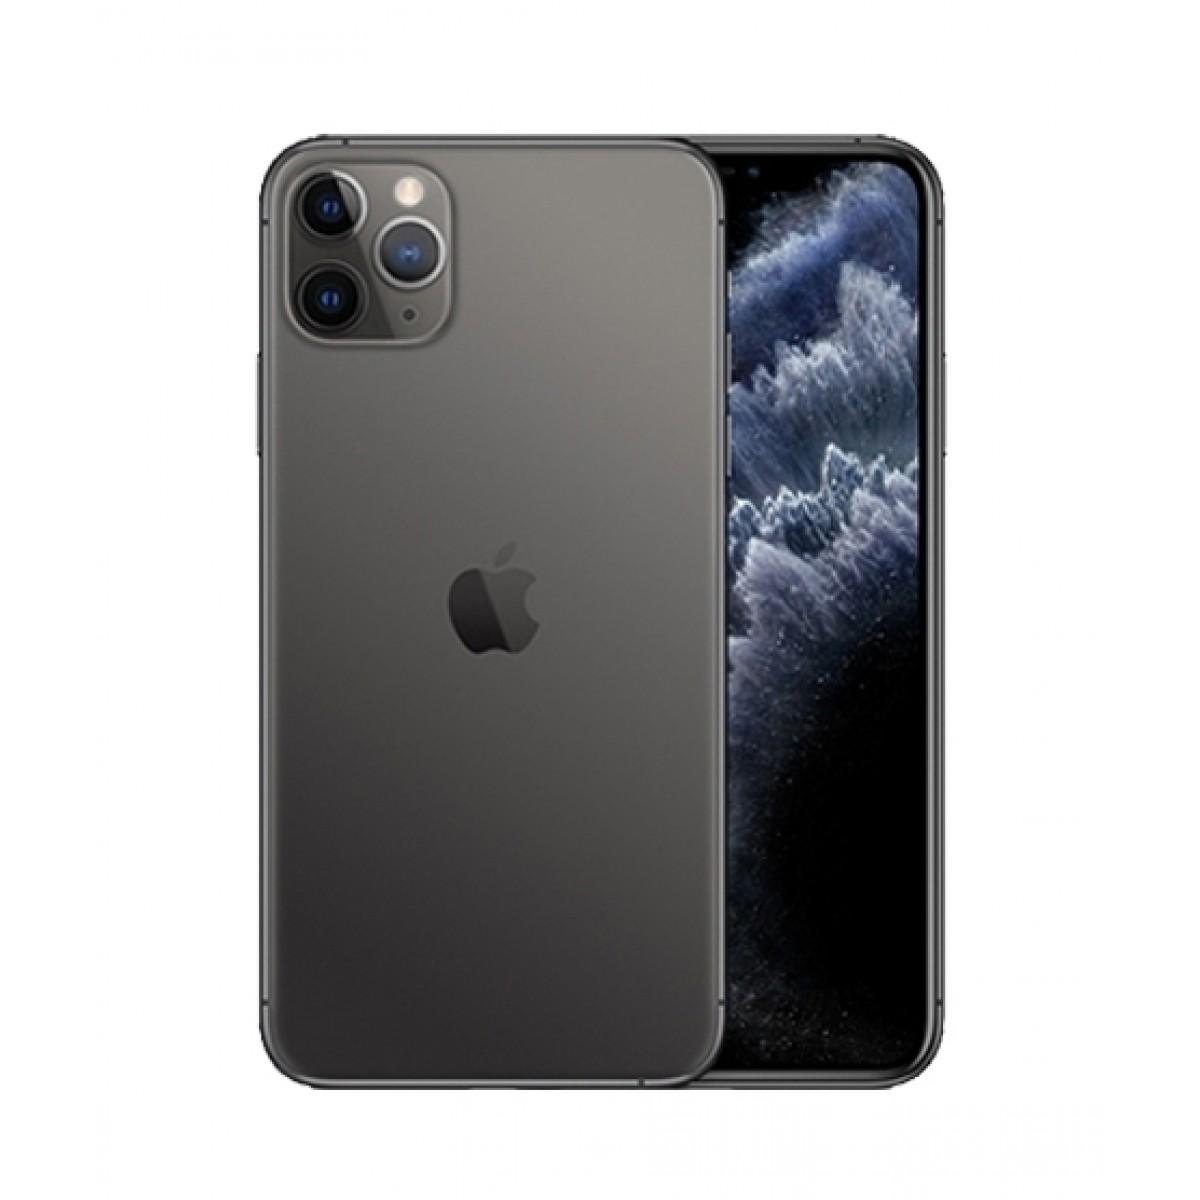 Apple iPhone 11 Pro Max (4GB 256GB)